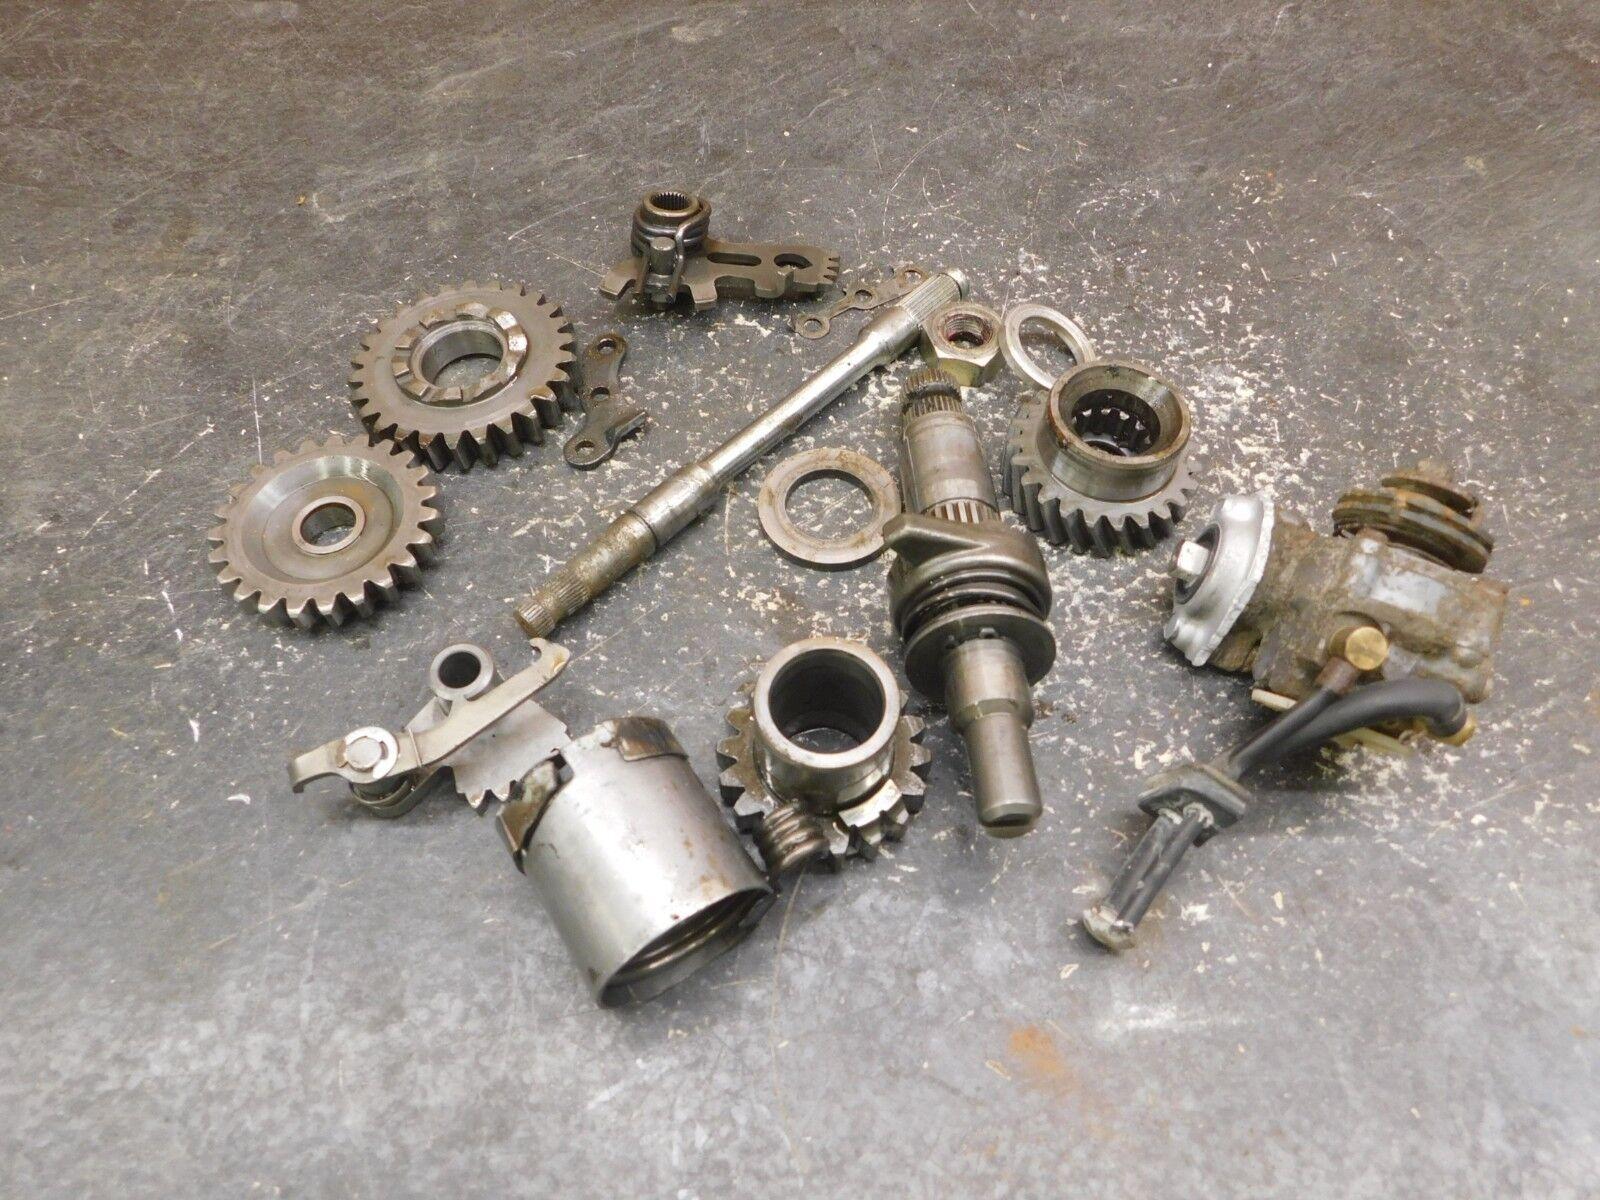 Yamaha Mx 250 Mx250 Engine Parts Lot    #3 1170